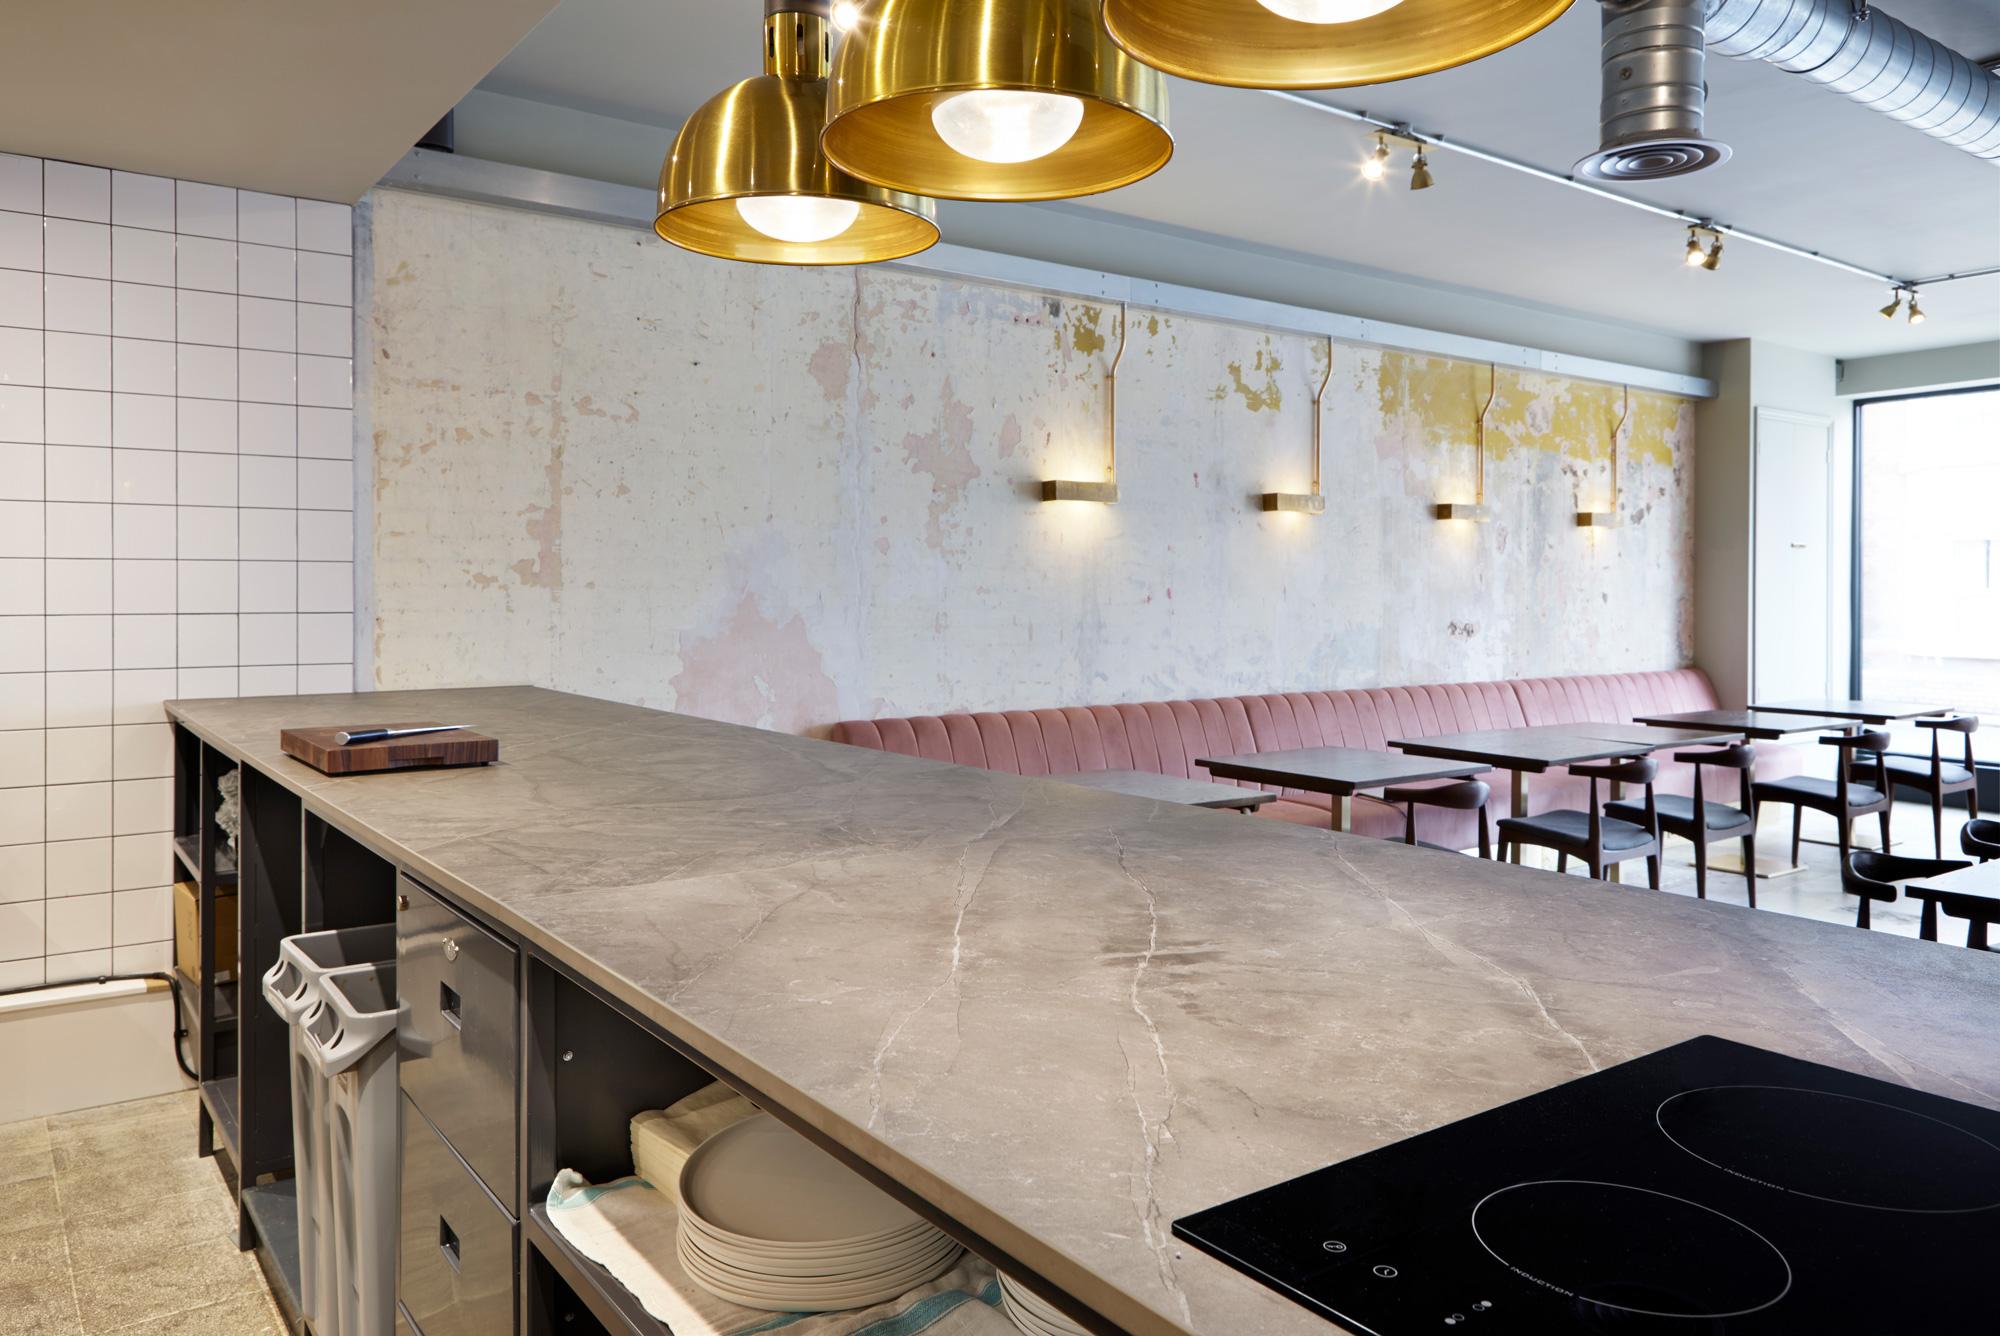 Vanderlyle restaurant  - Vanderlyle restaurant Dekton 5 49